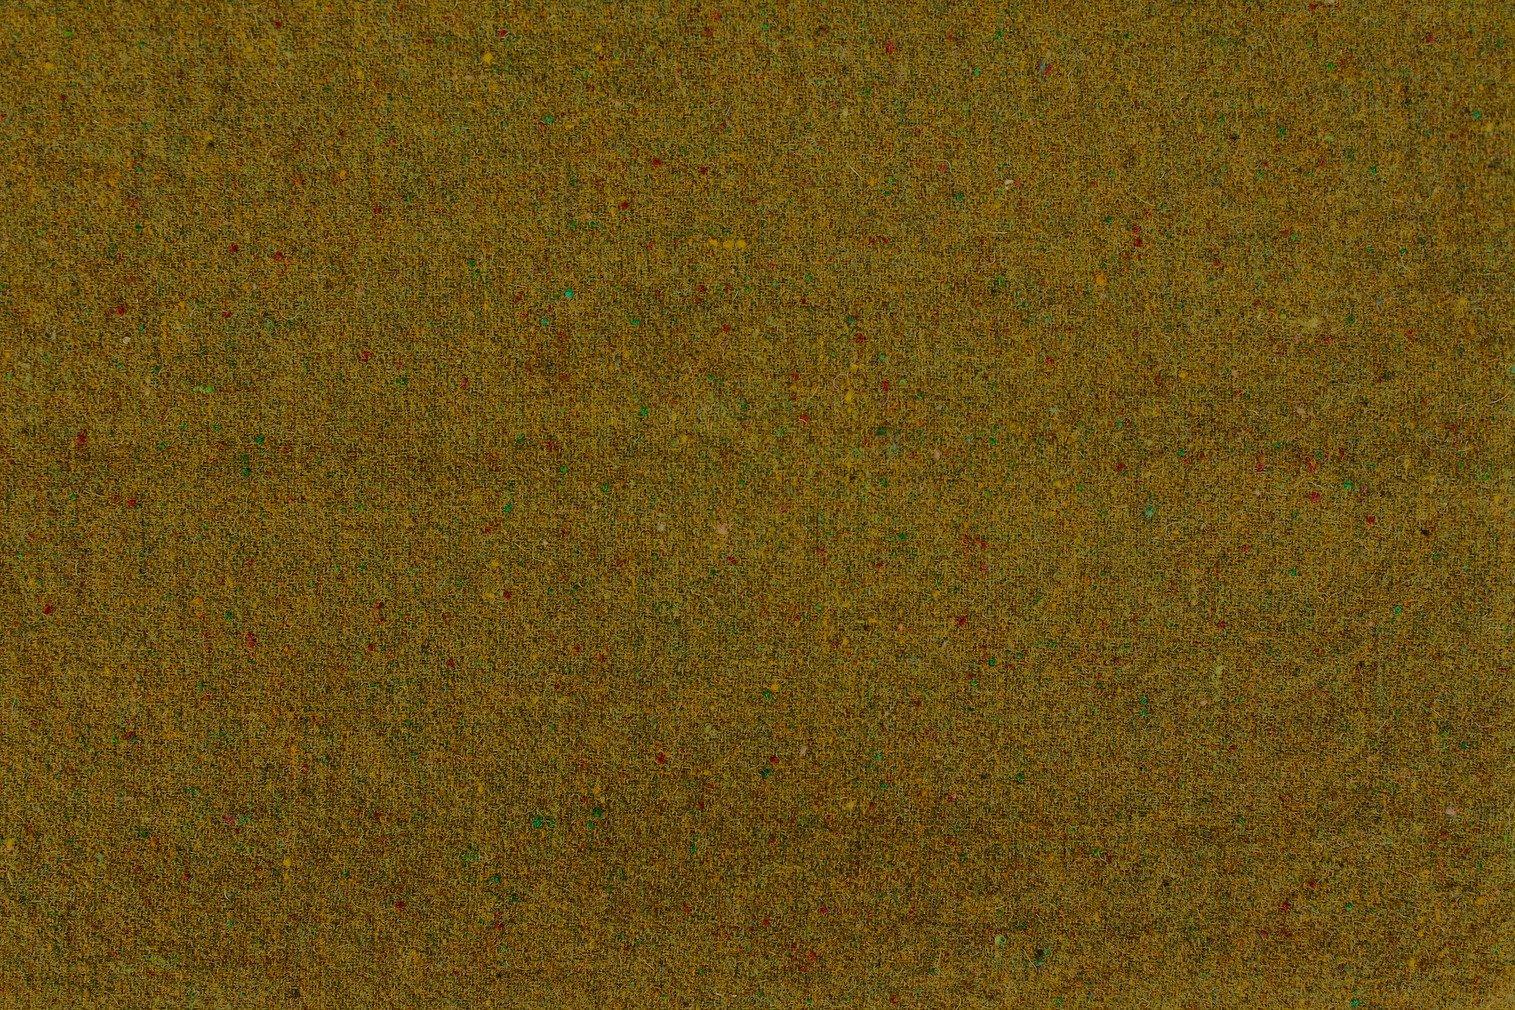 Pond Green 18 X 21 100% Wool